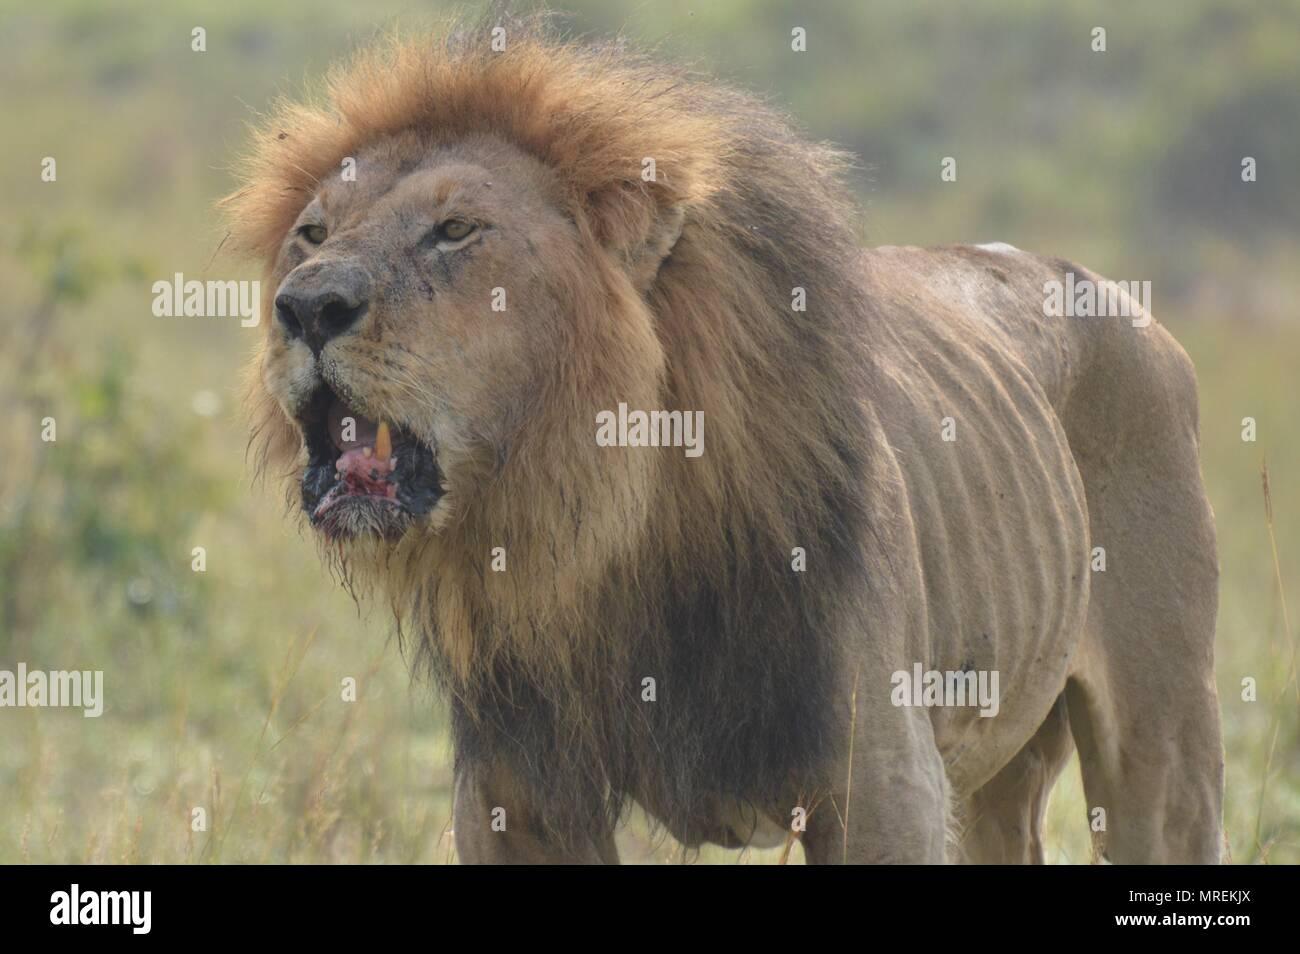 Male lion with full mane roars on Maasai Mara - Stock Image